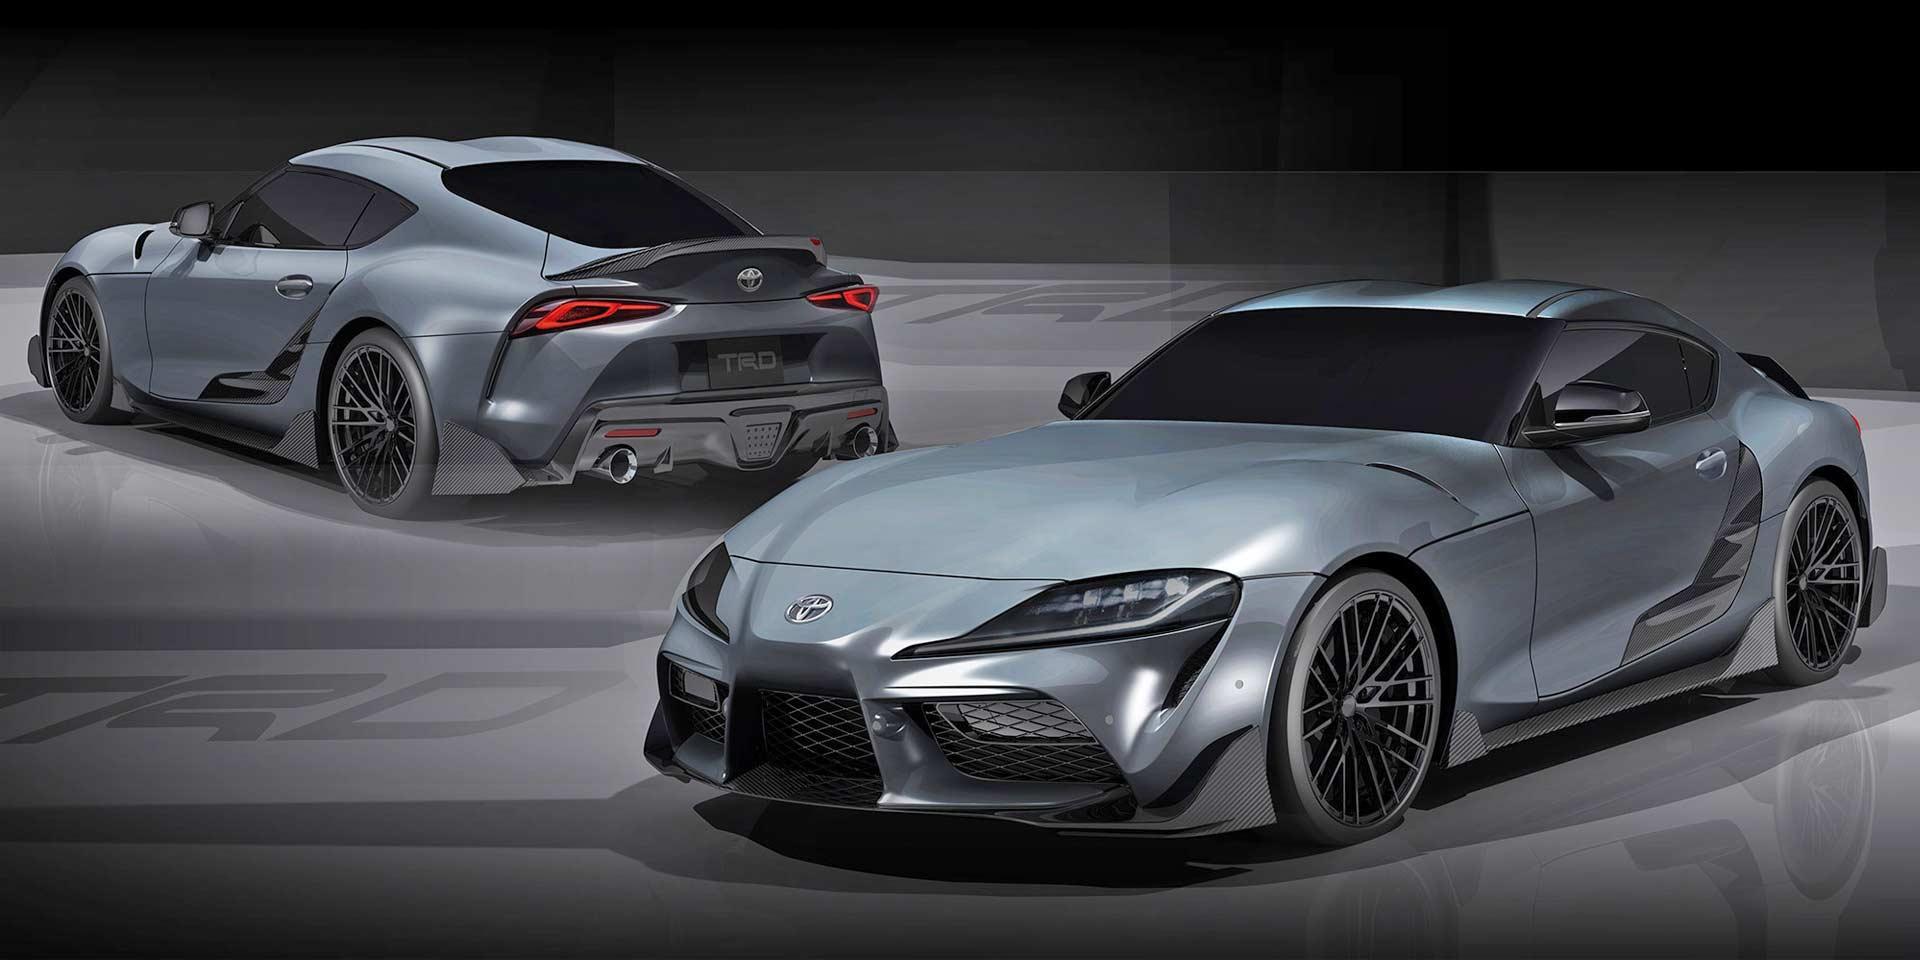 2020-Toyota-Supra-TRD-parts-concept